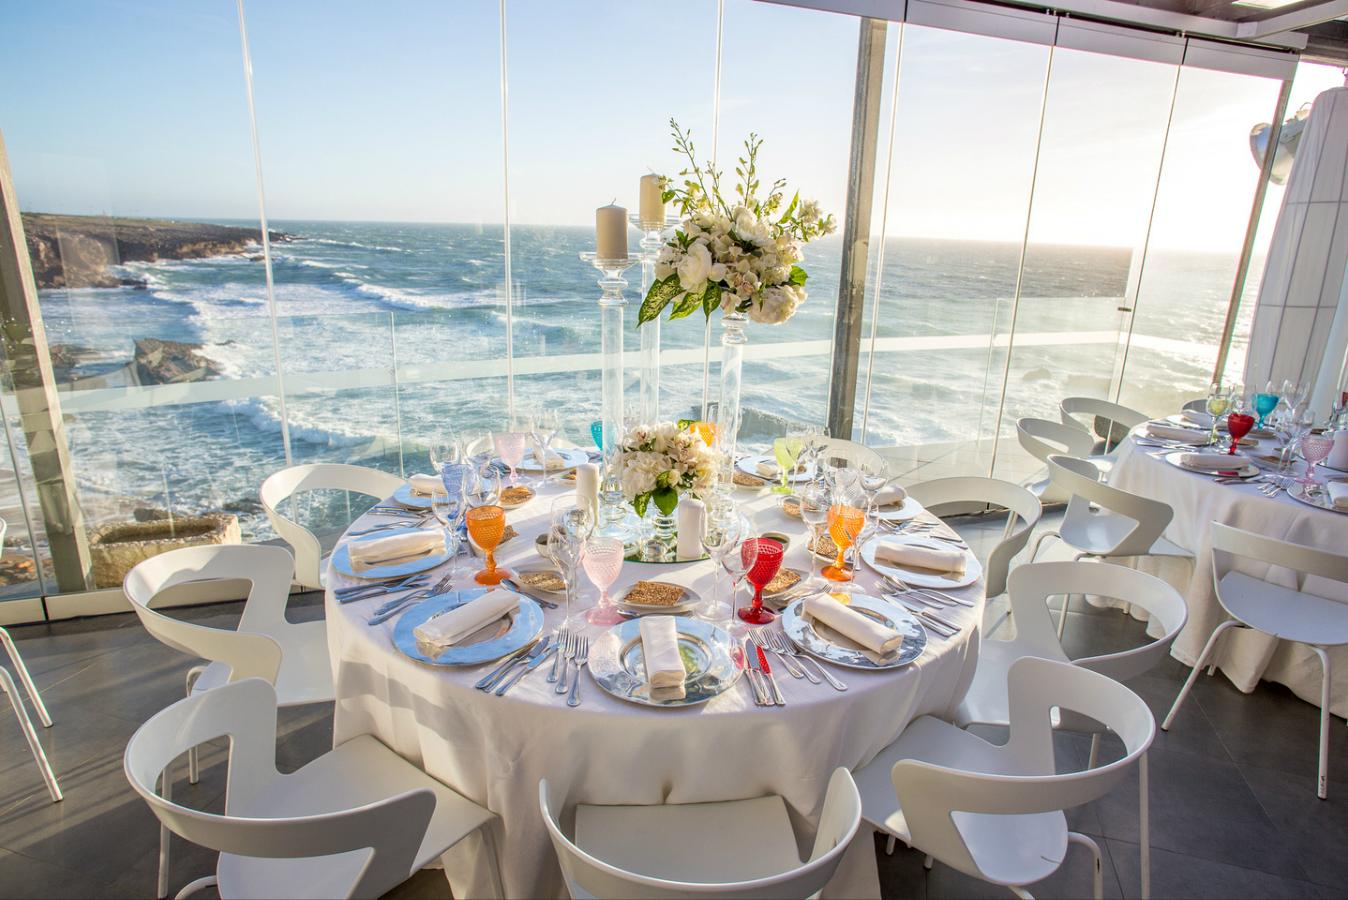 Arriba-by-the-sea-wedding-portugal-20